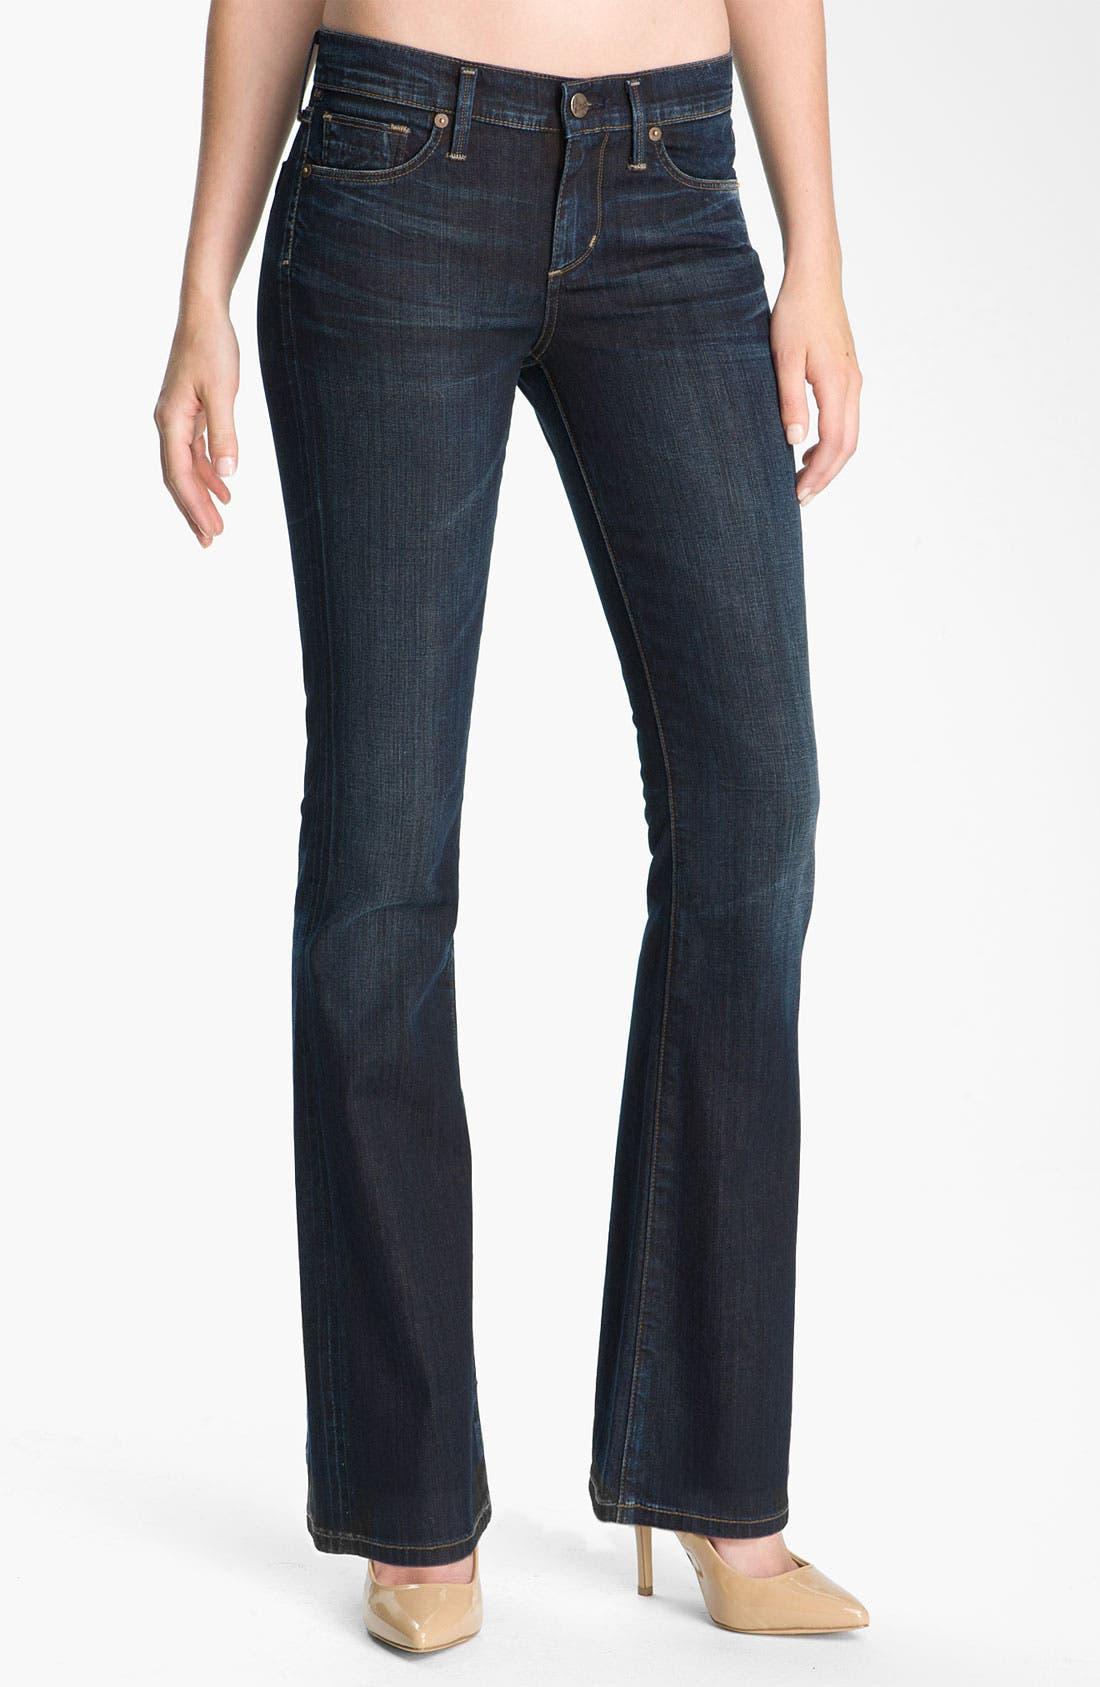 Main Image - Citizens of Humanity 'Dita' Bootcut Jeans (Felt Dark Blue) (Petite)